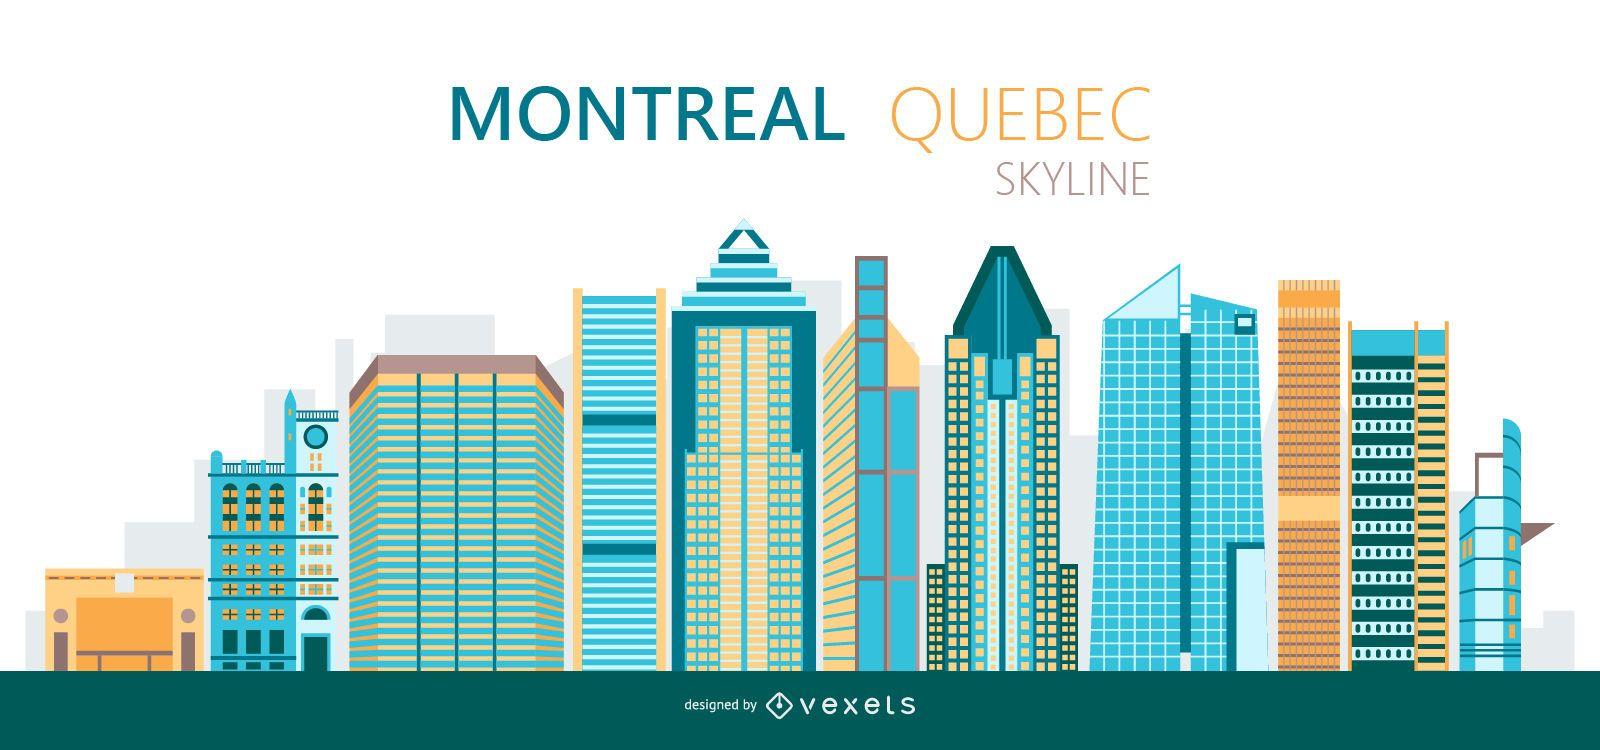 Montreal skyline illustration